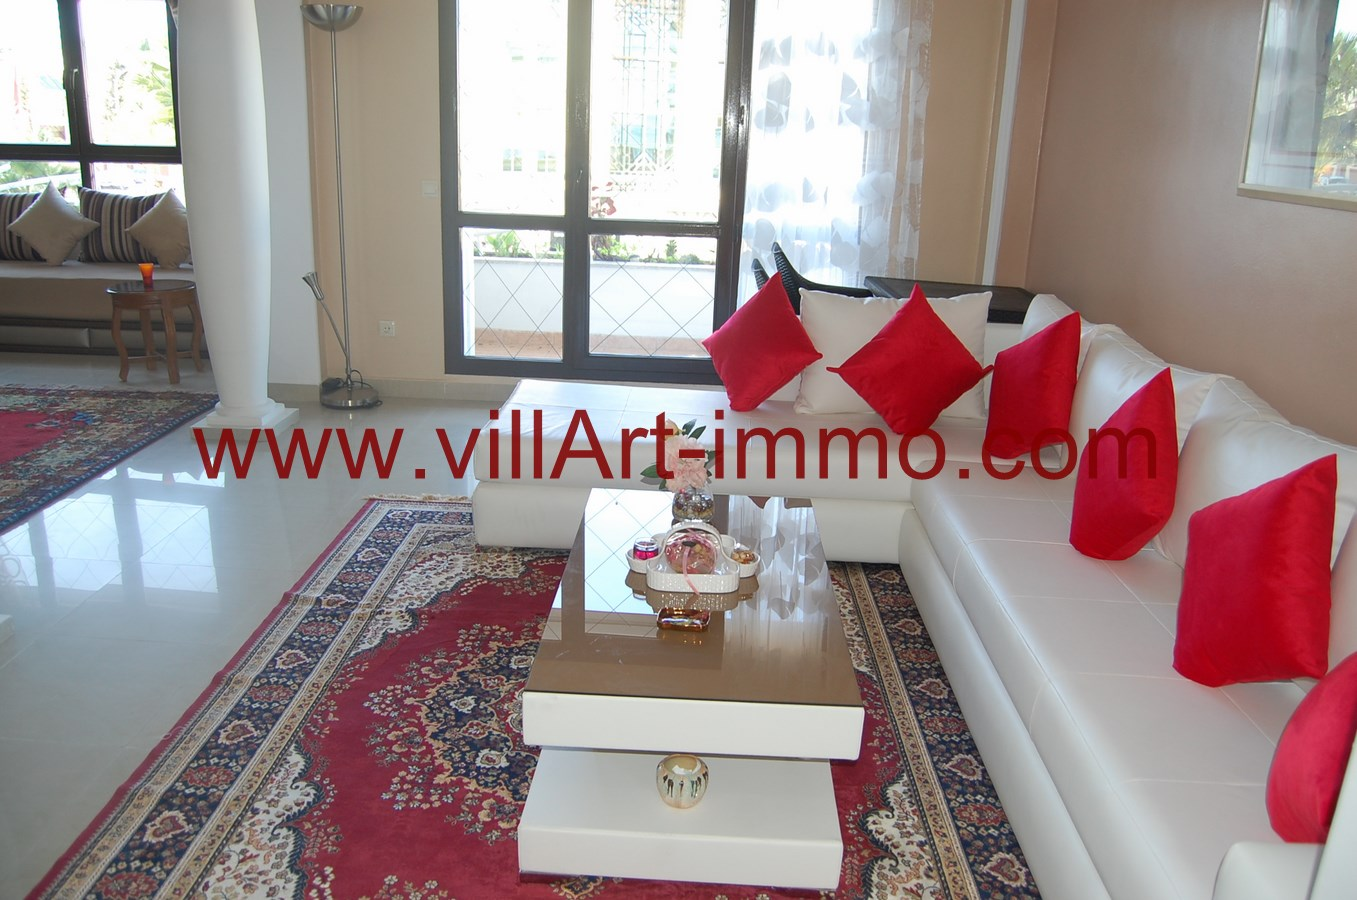 1-vente-appartement-tanger-iberia-salon-1-va435-villart-immo